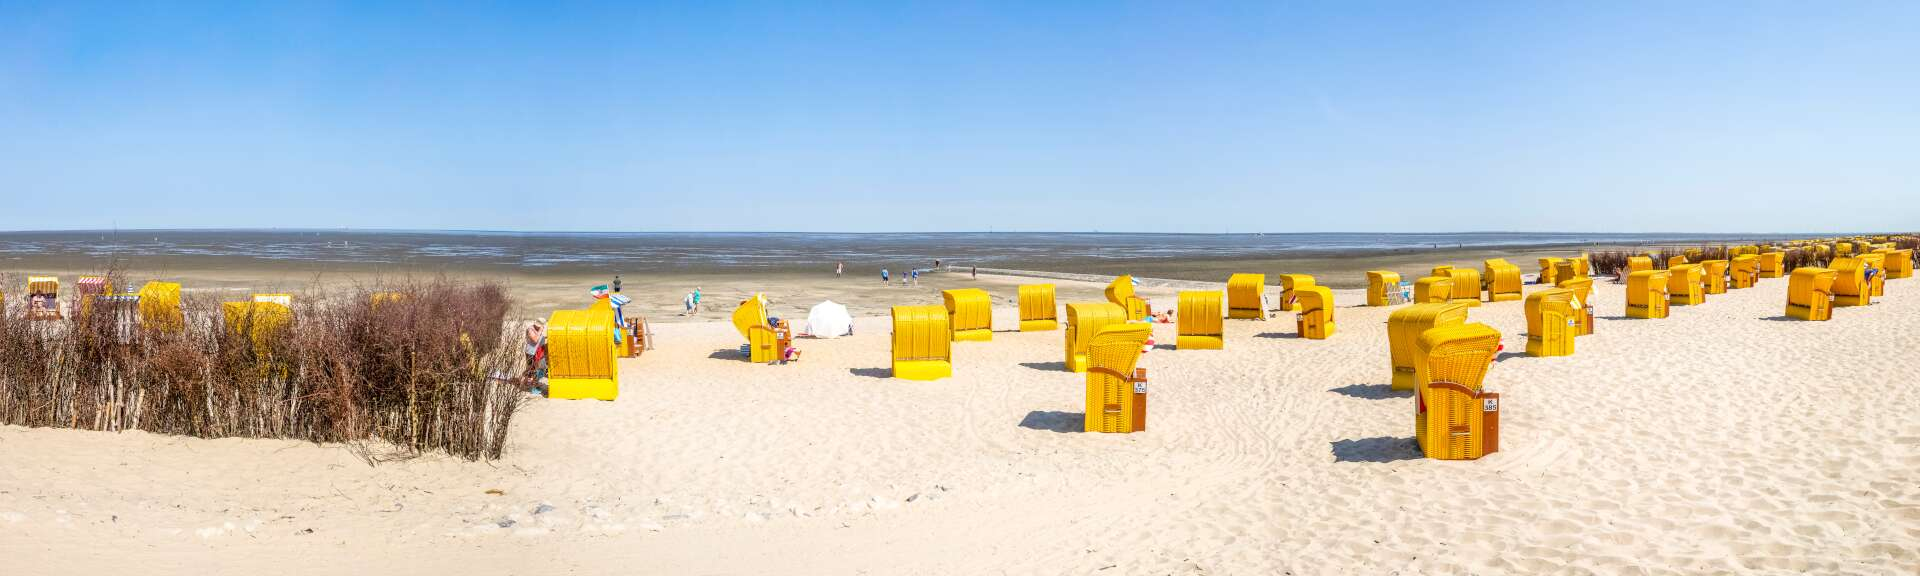 Klassenfahrt Nordsee Strand